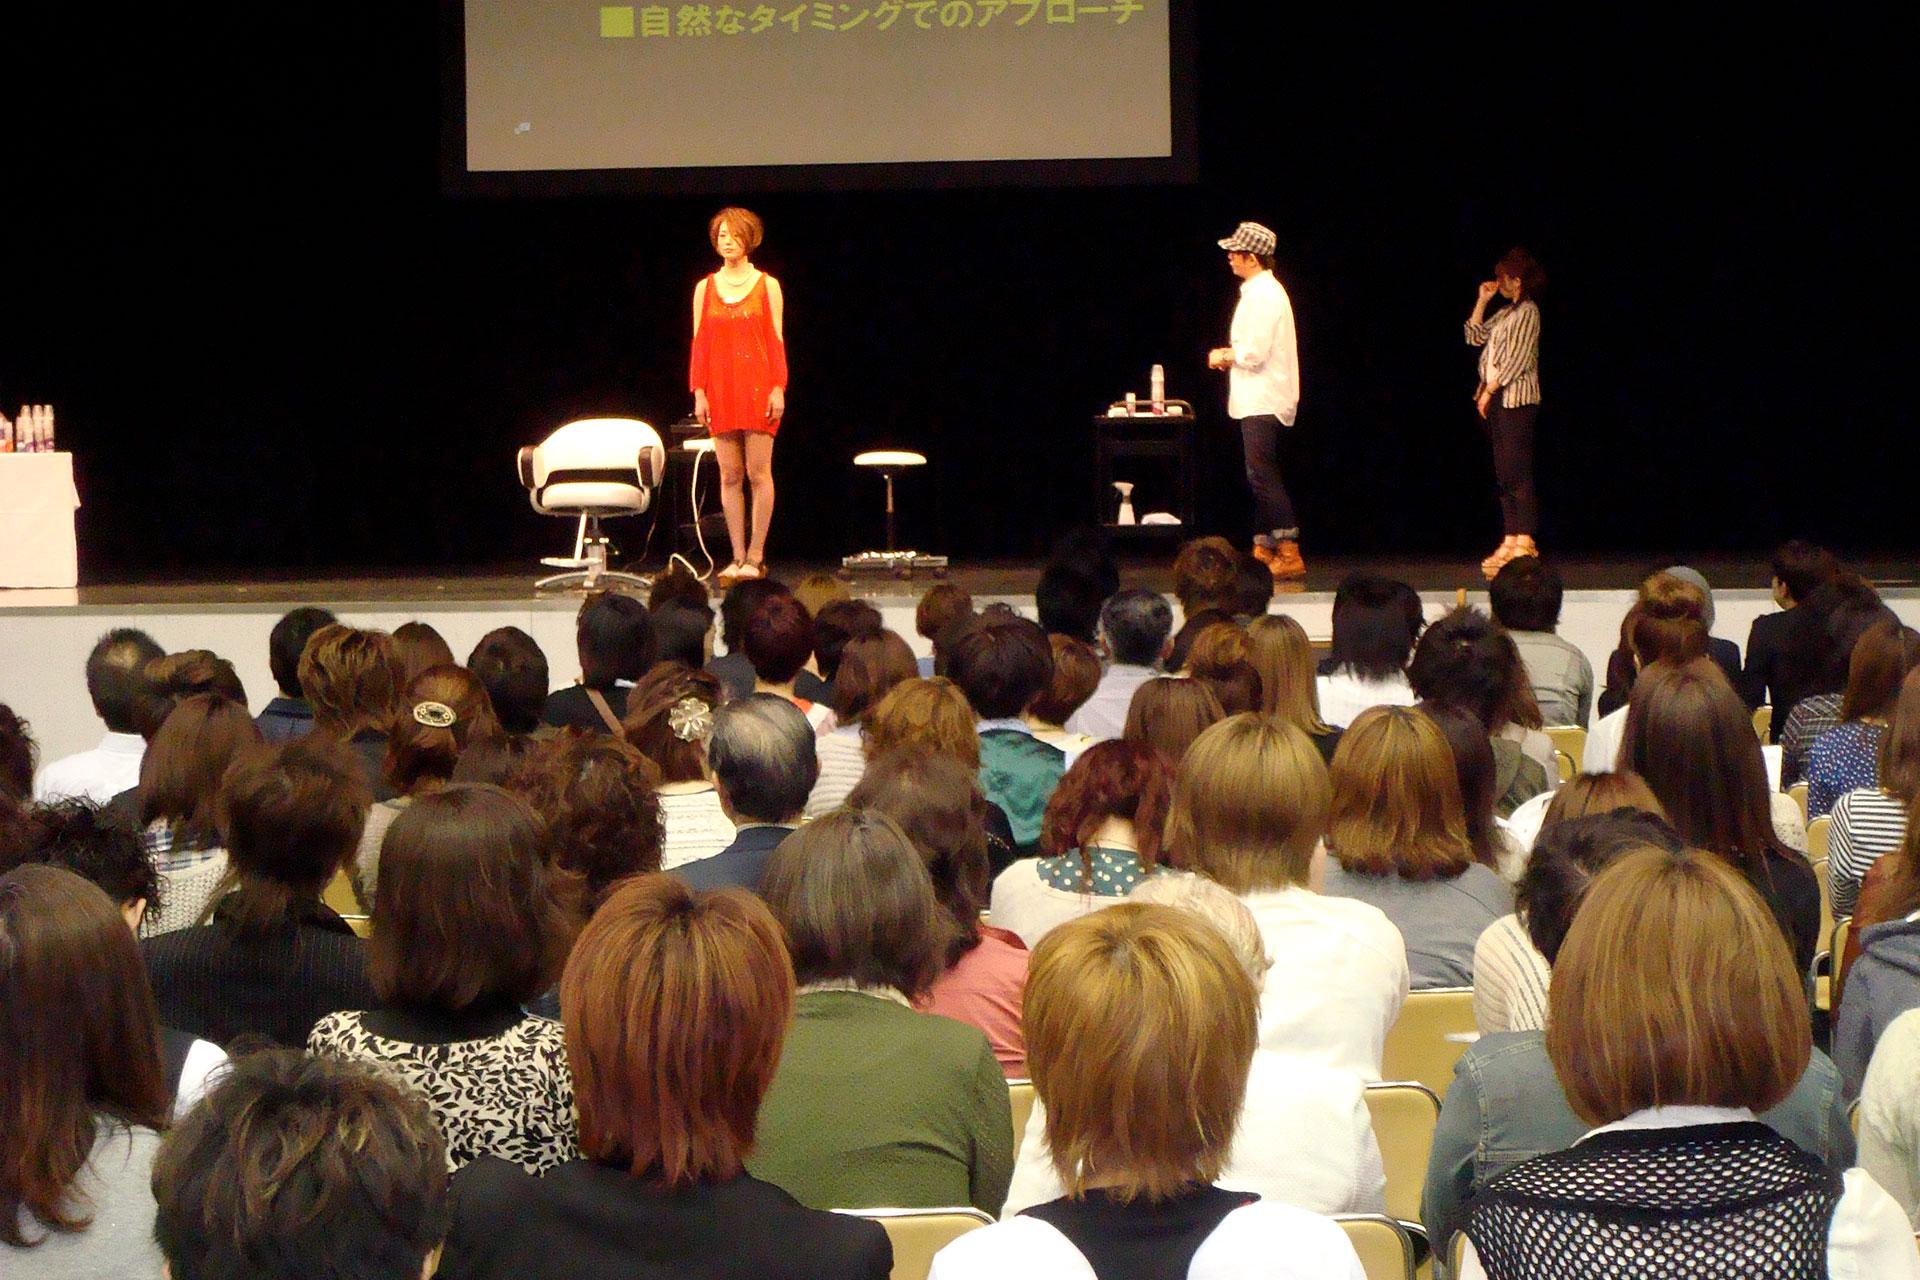 hikari_expo_01.jpg